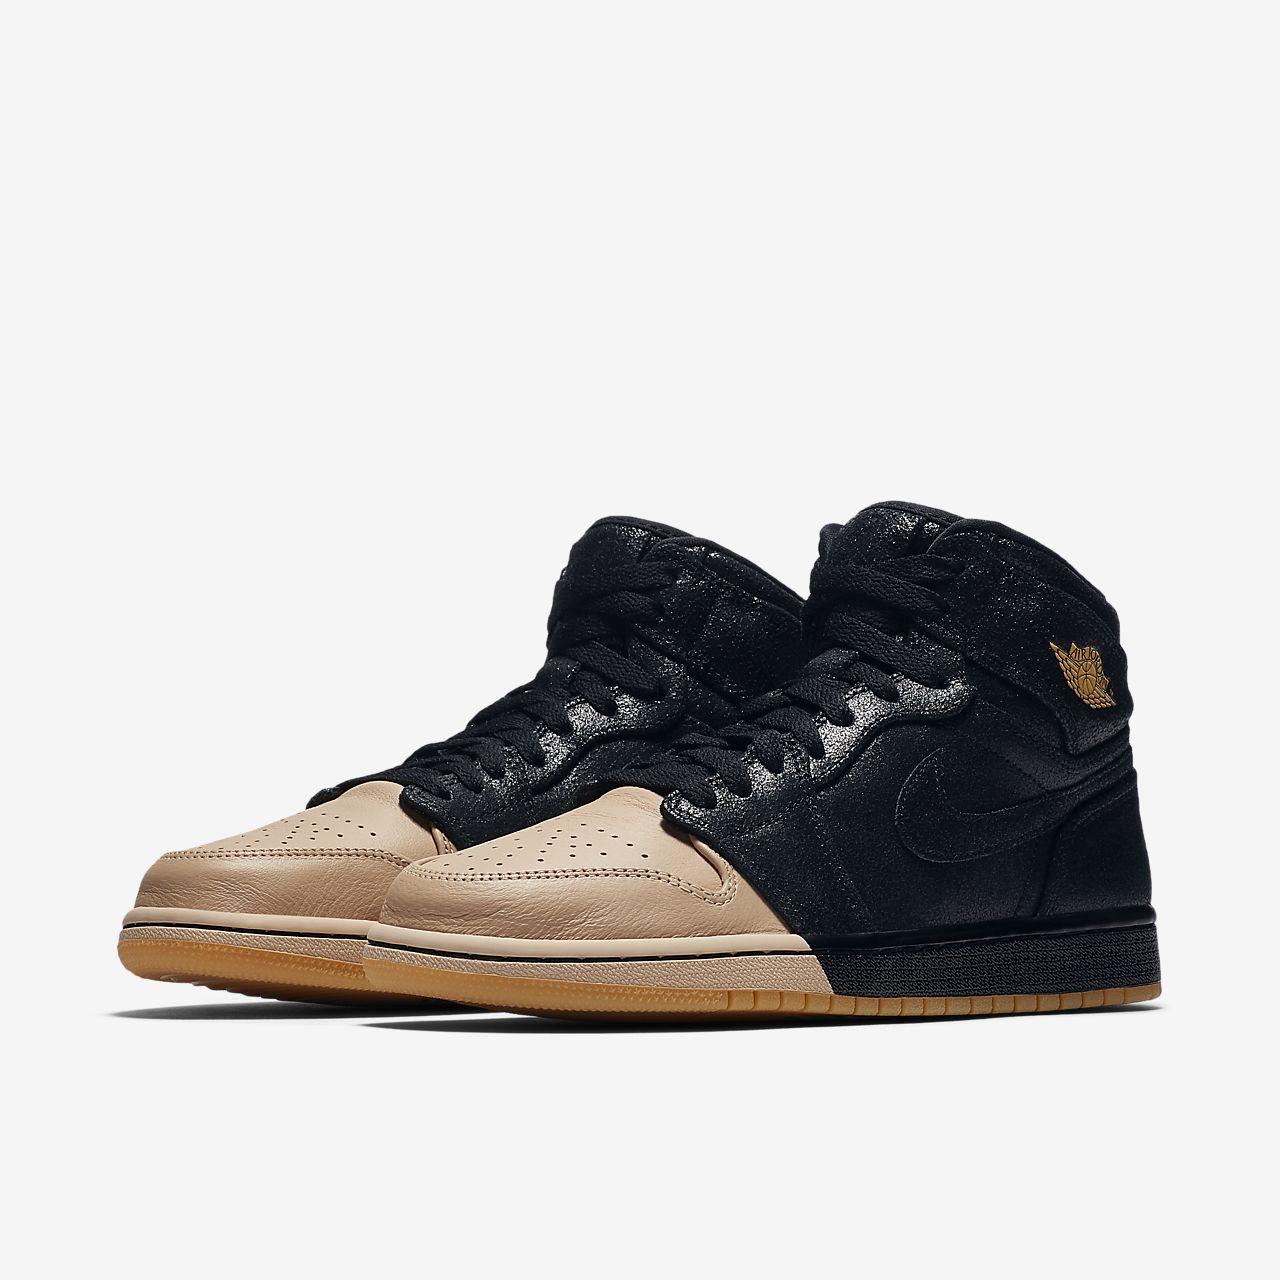 new arrival ba478 74d13 ... Nike Air Jordan 1 Retro High Premium Women s Shoe